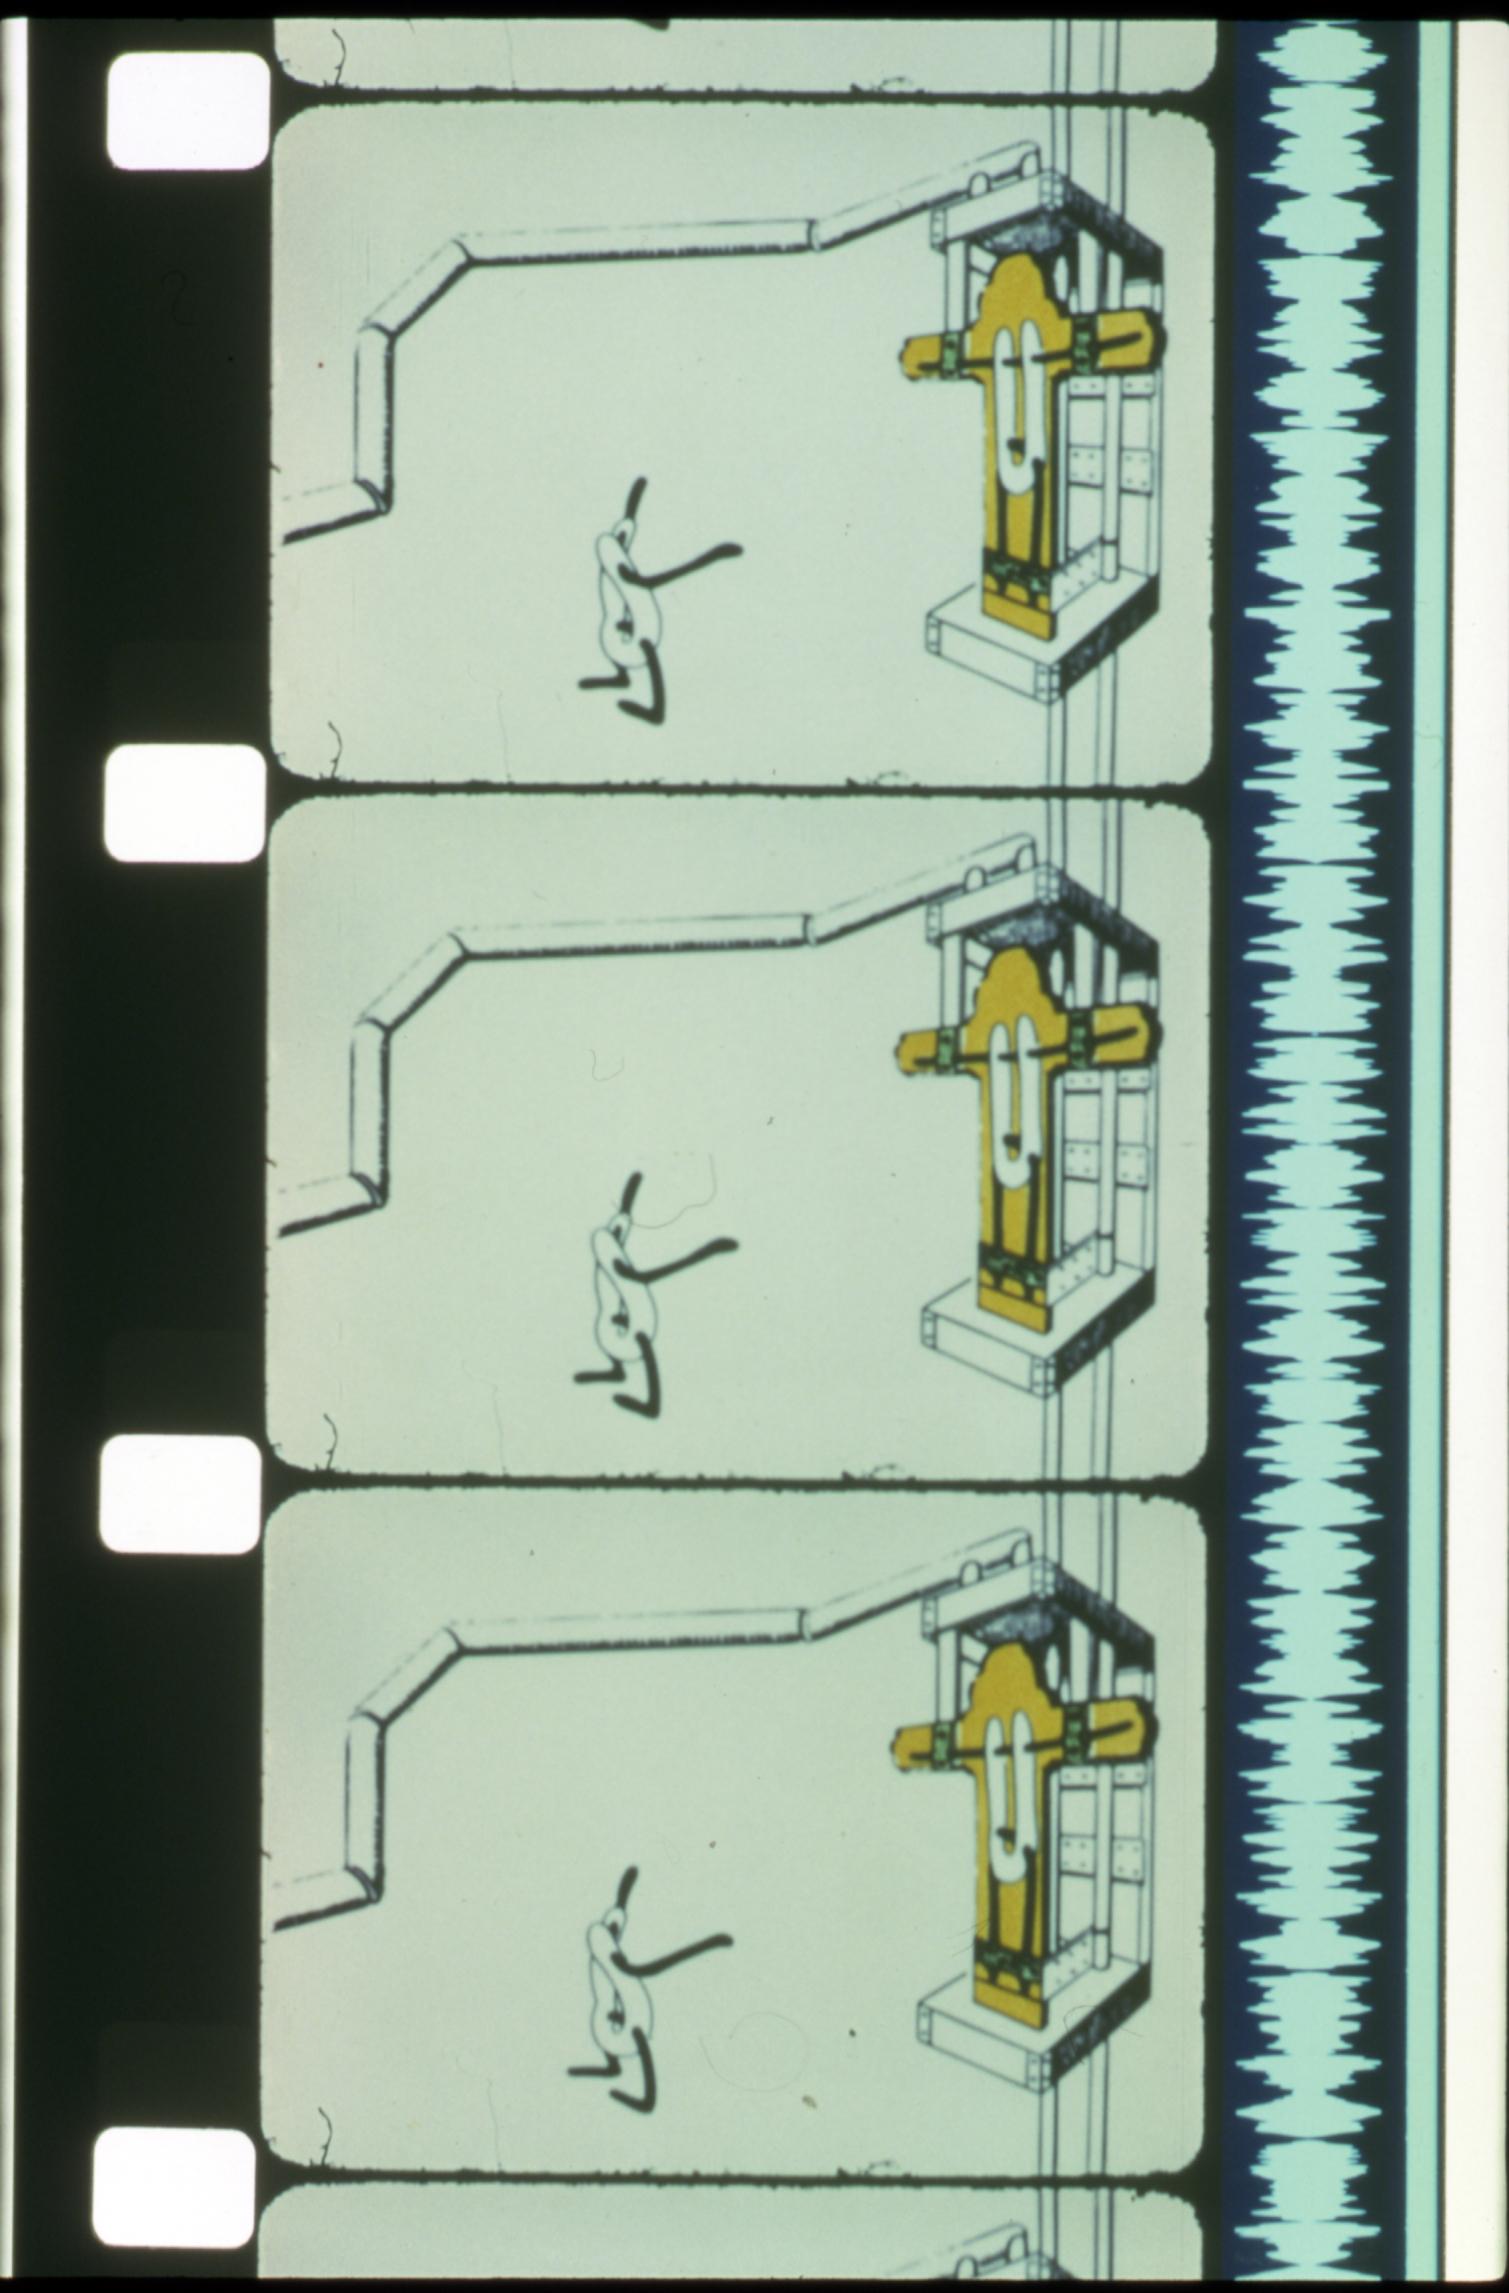 ilm & Video Archive Filmform – The Art F